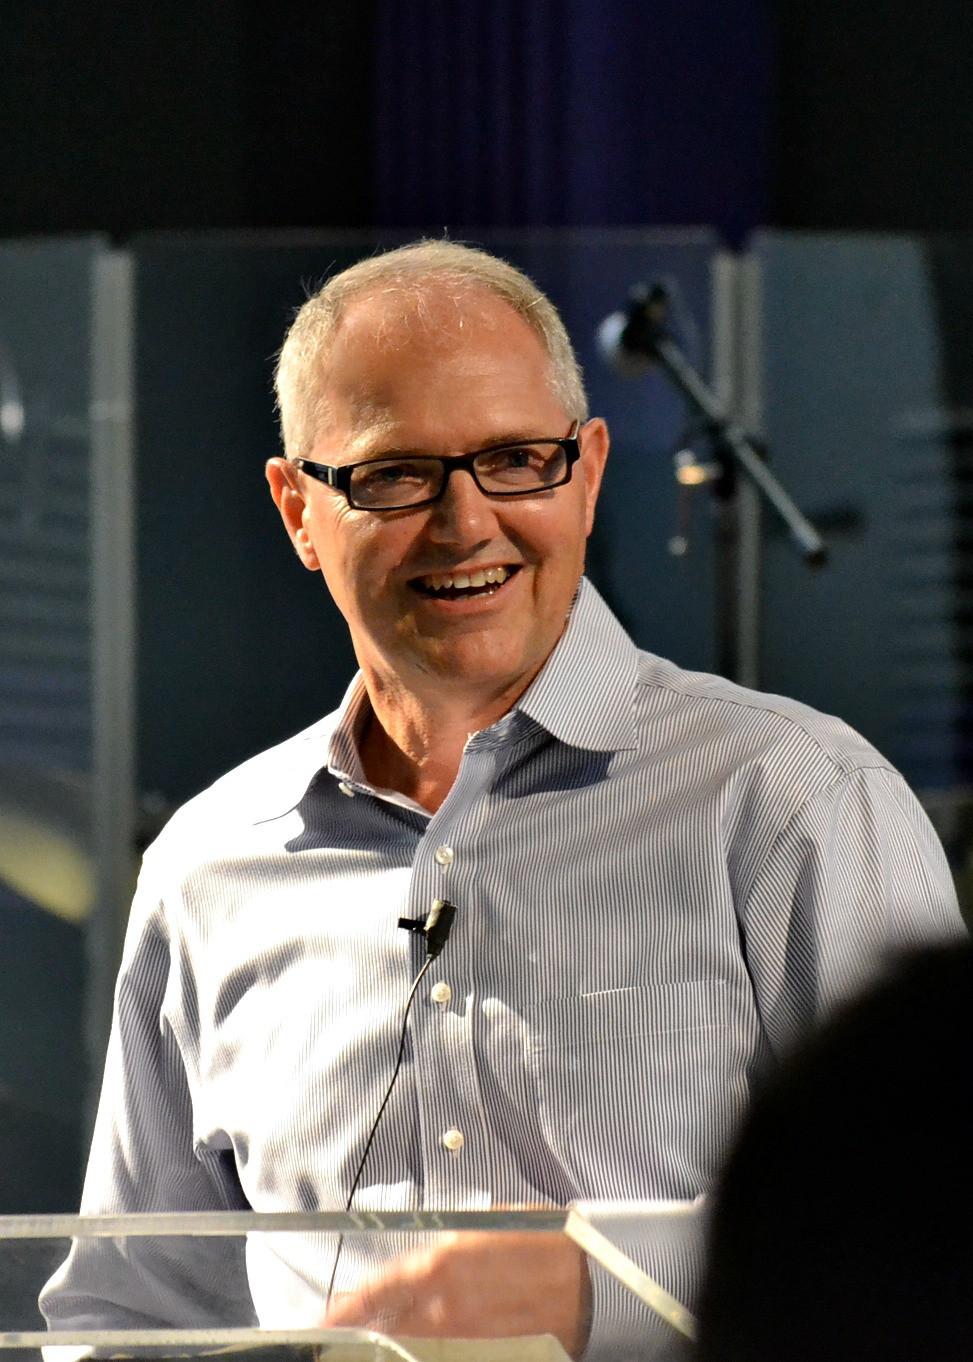 Dr. Steven Bontrager, Chair of Christian Ministries